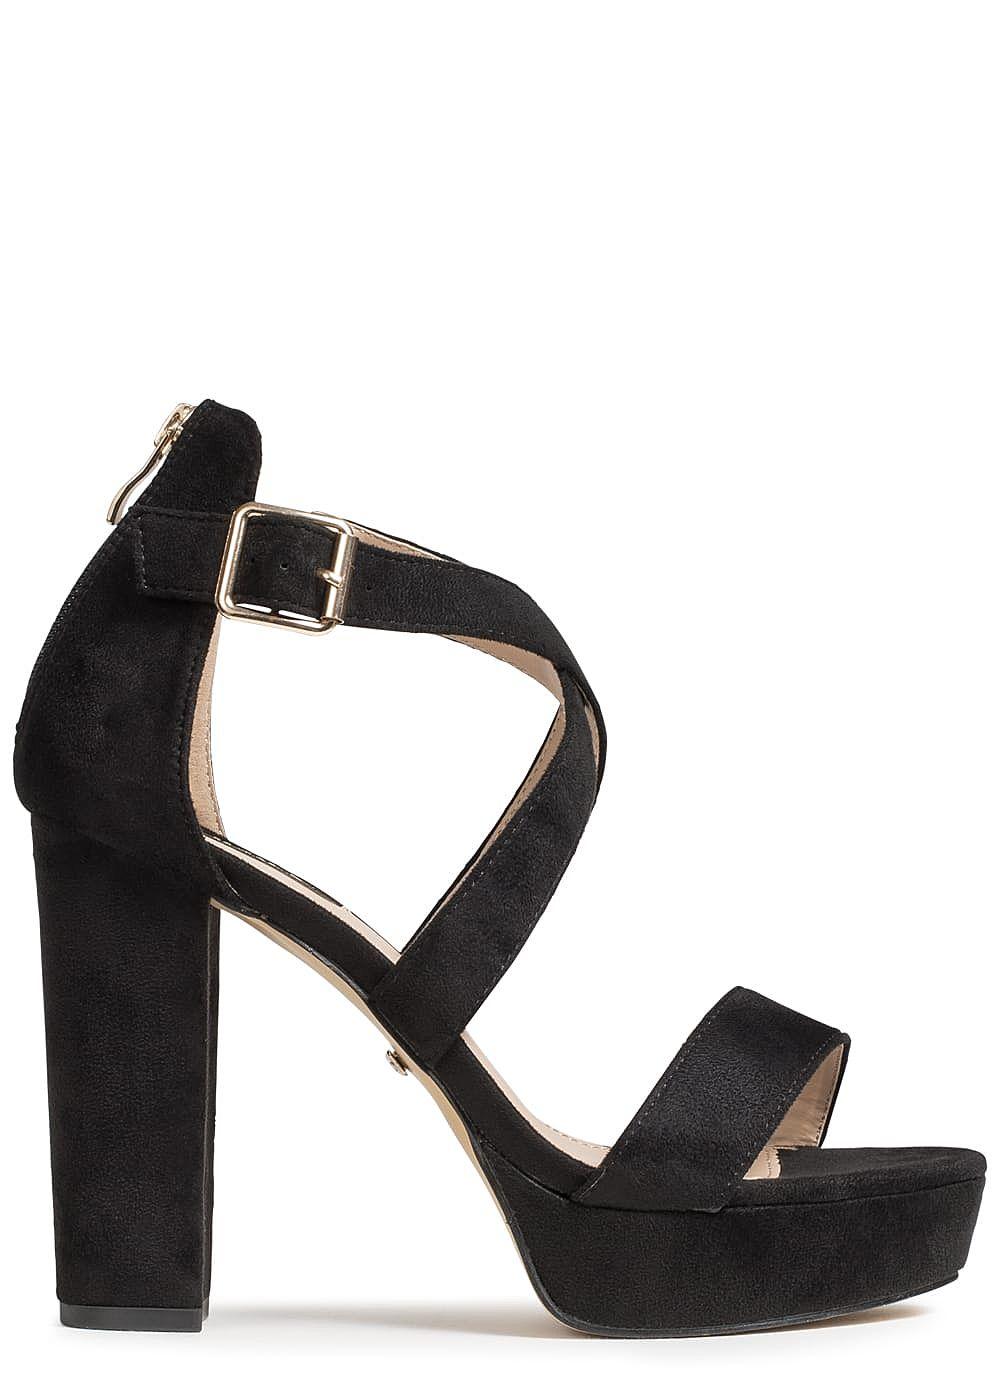 seventyseven lifestyle damen schuh sandalette blockabsatz 11 5cm wildleder optik schwarz. Black Bedroom Furniture Sets. Home Design Ideas